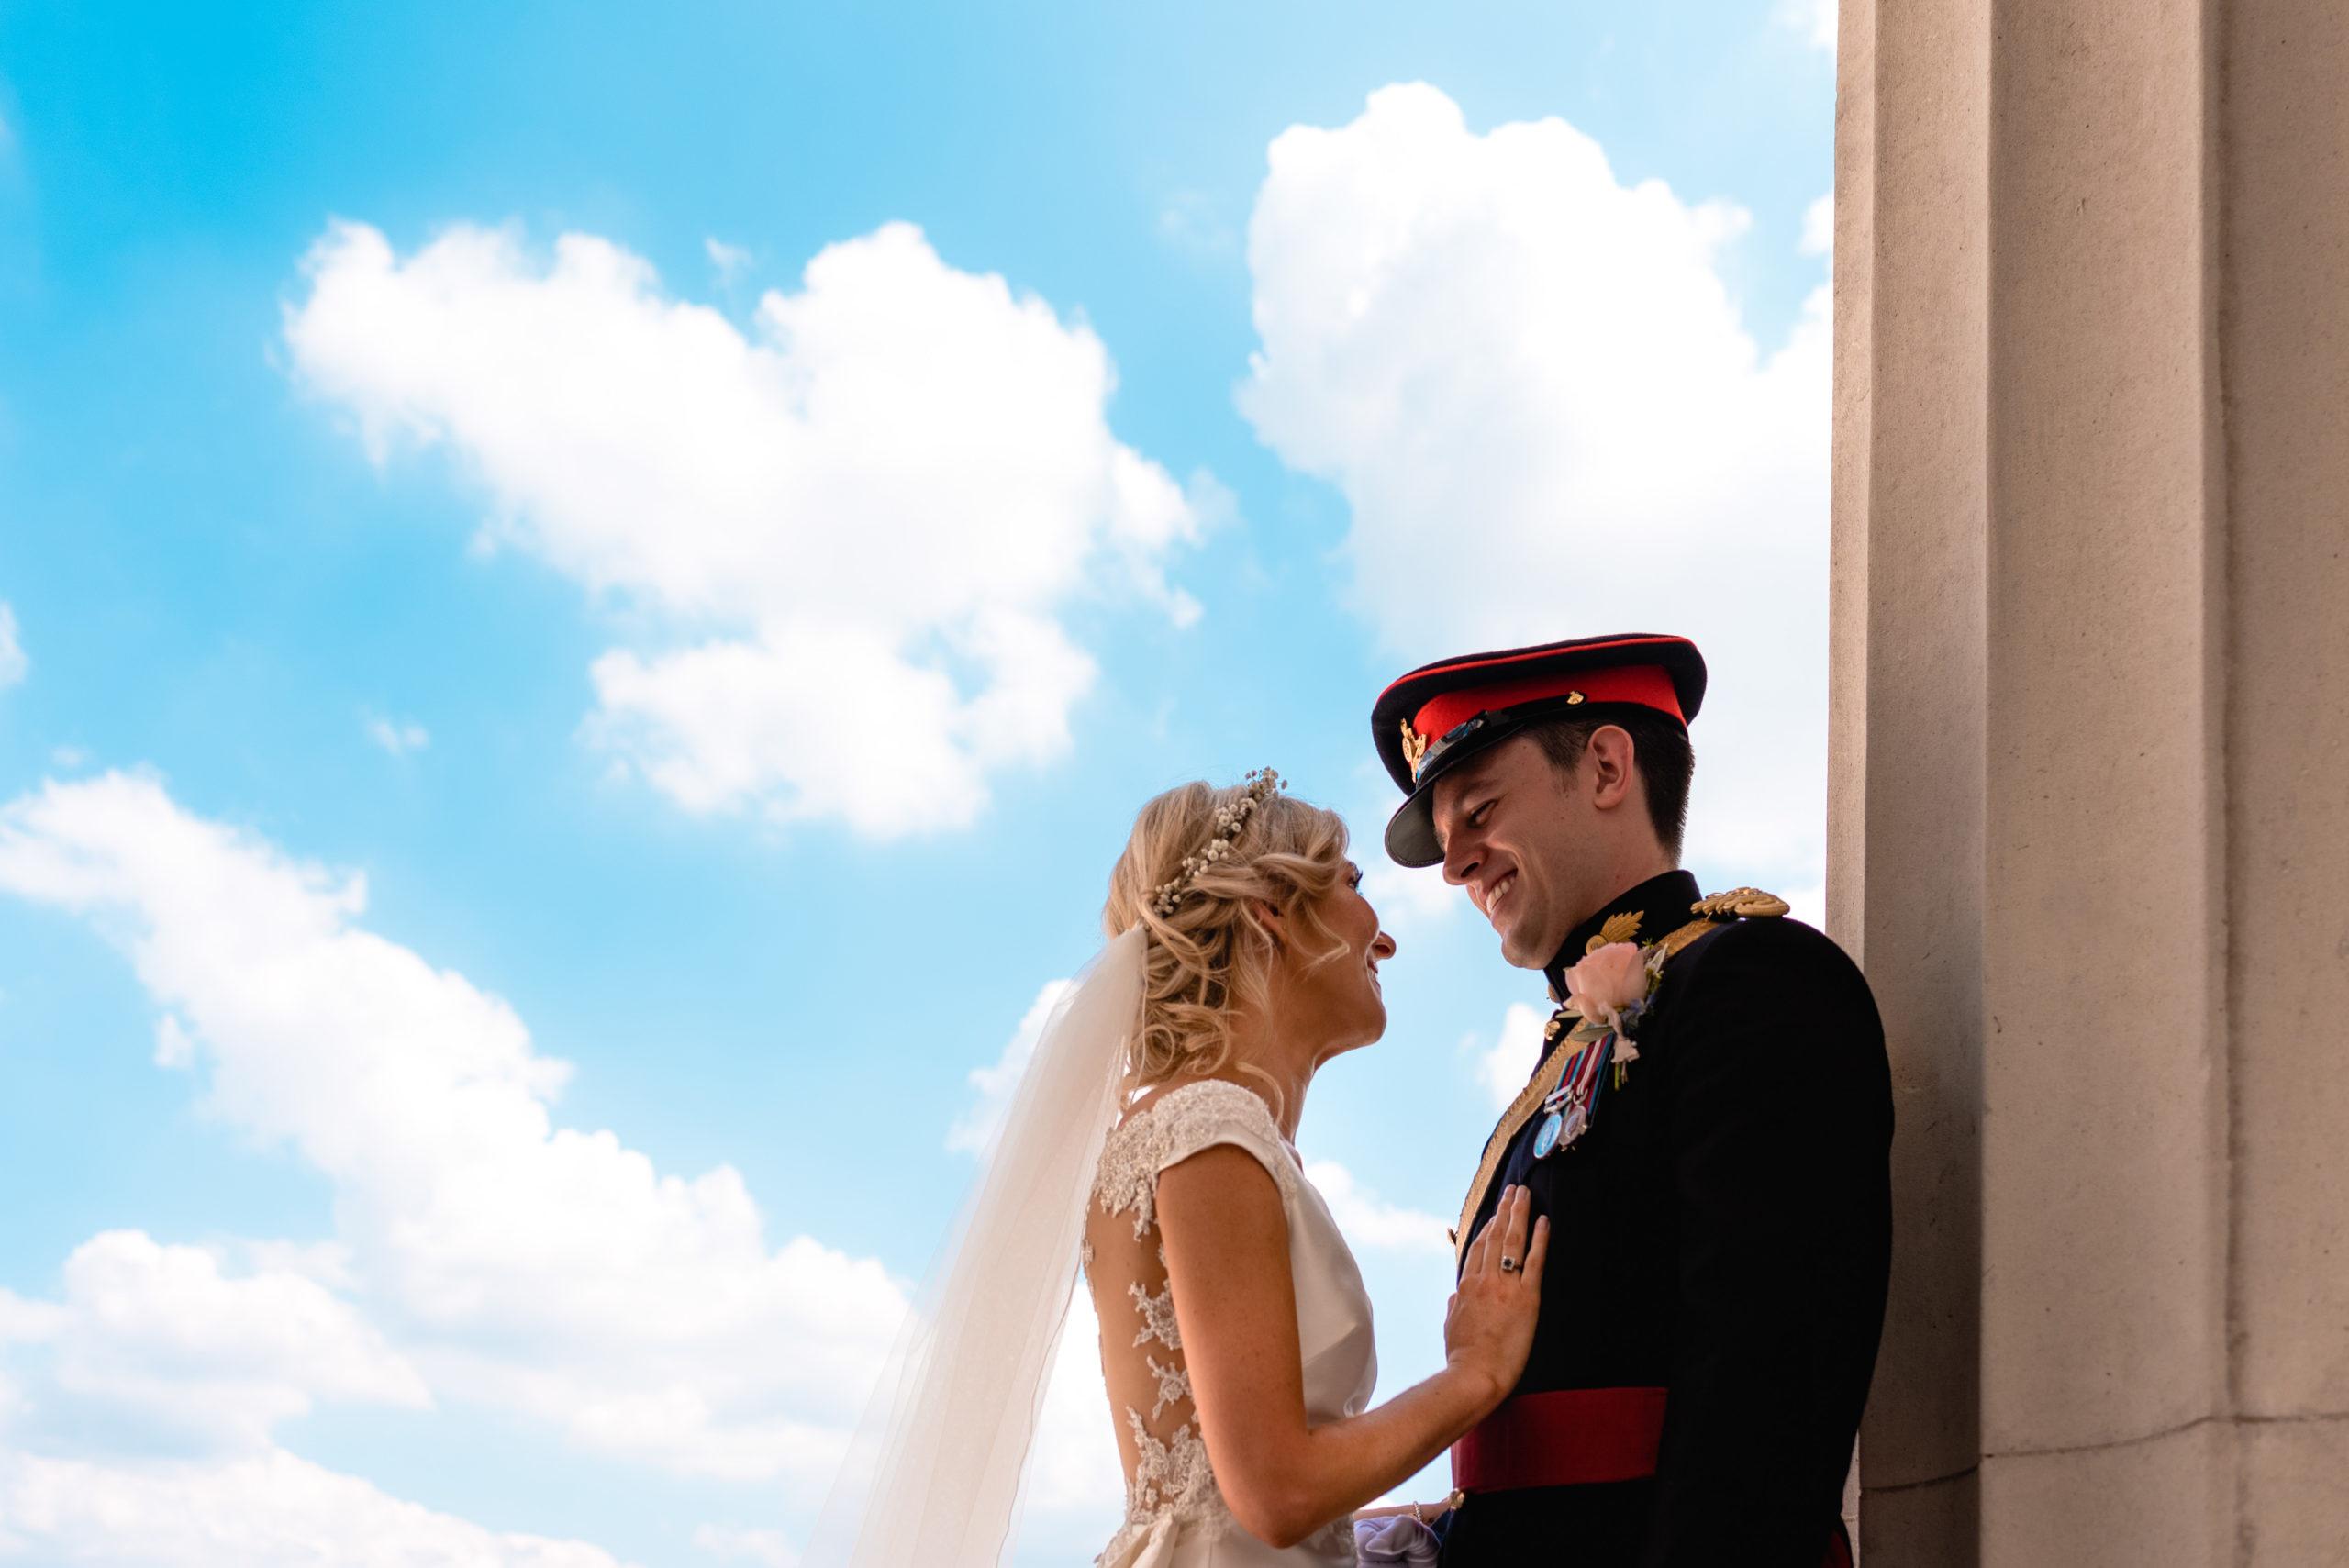 Wedding at Royal Military Academy Sandhurst, UK